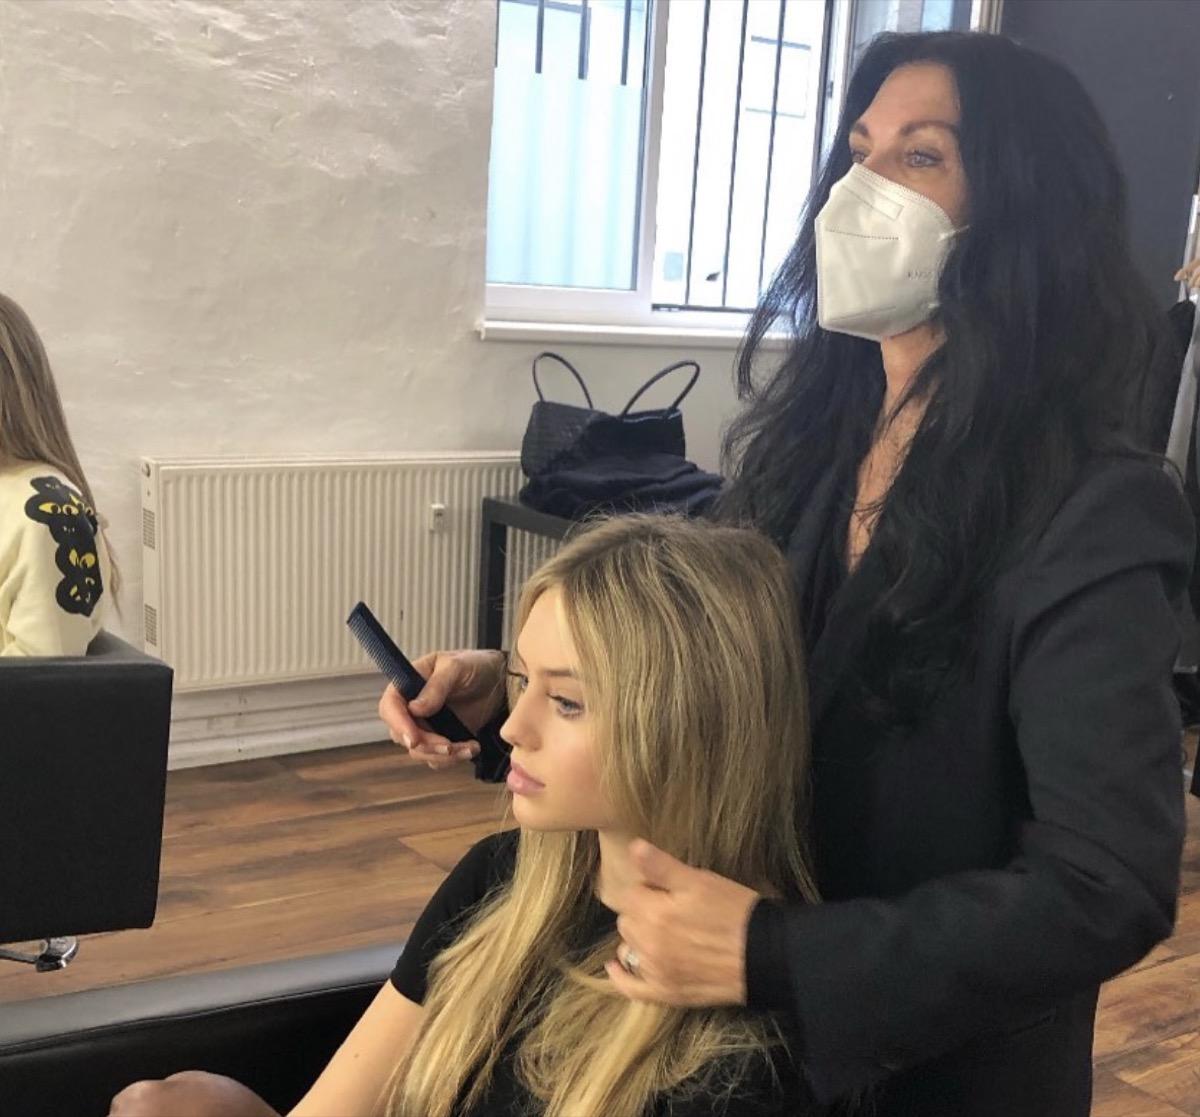 leni klum getting her hair done